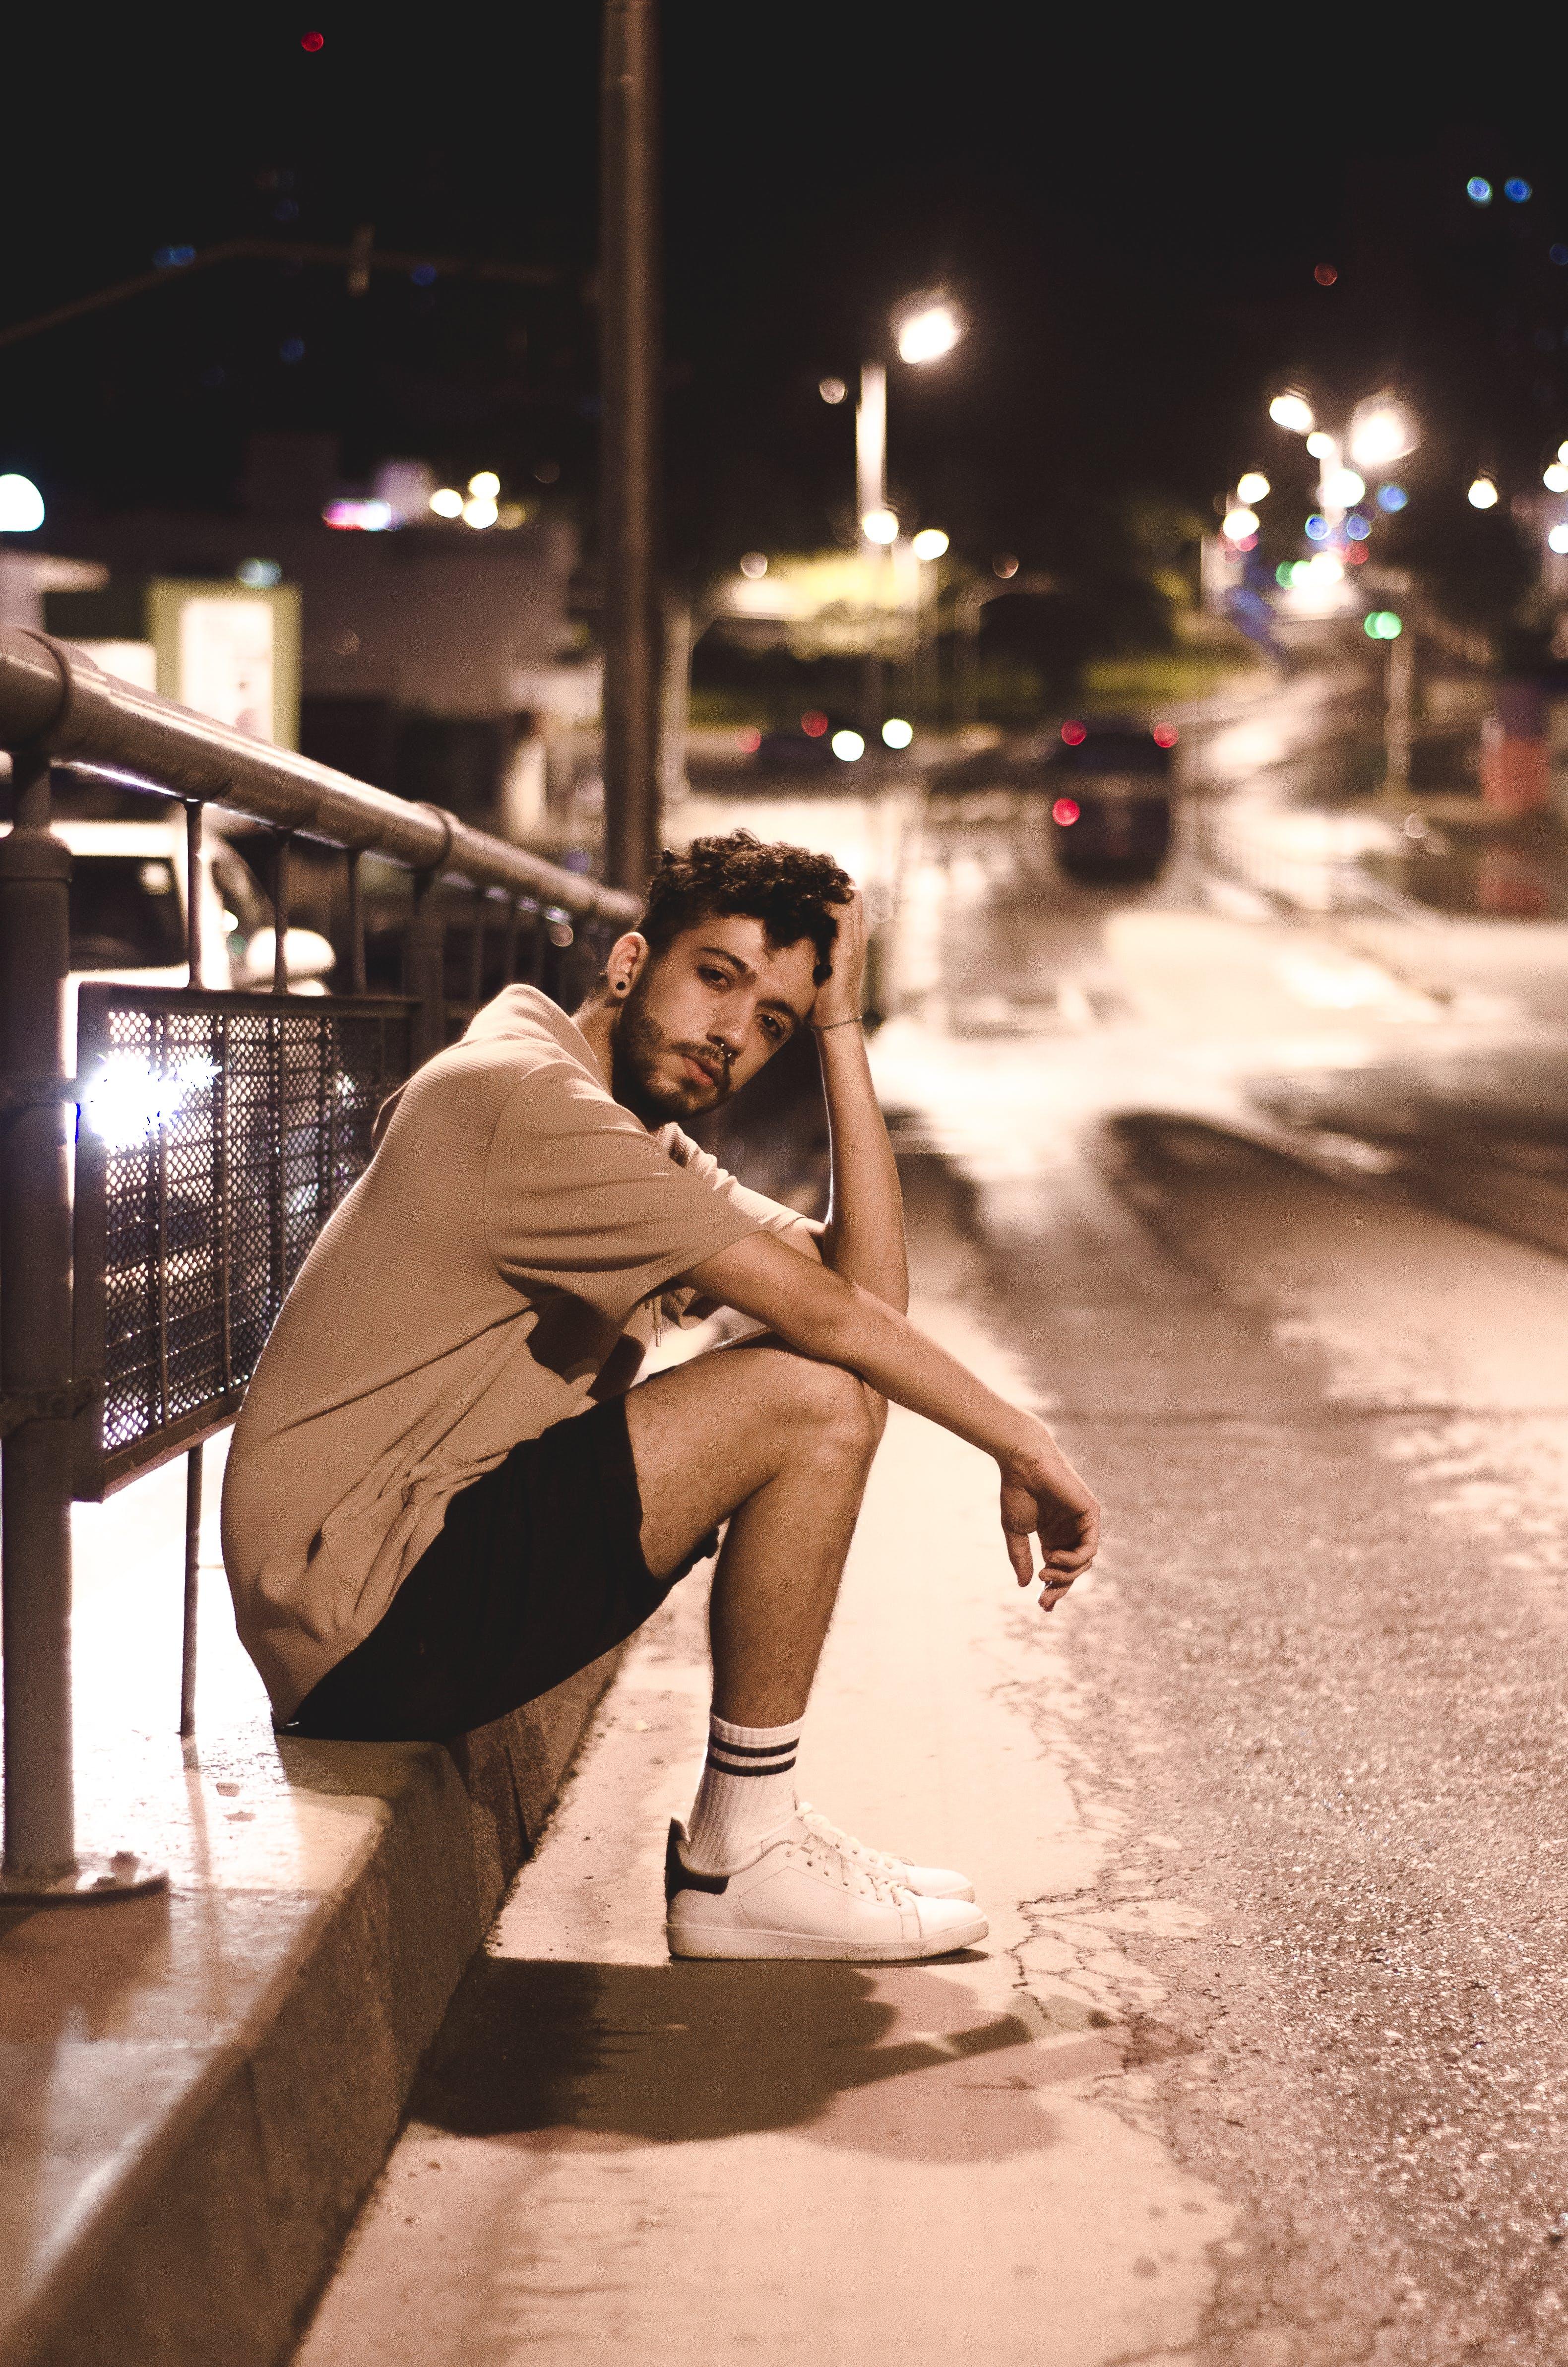 Man Wears Brown Shirt and Black Shorts Seats Beside Black Street Post